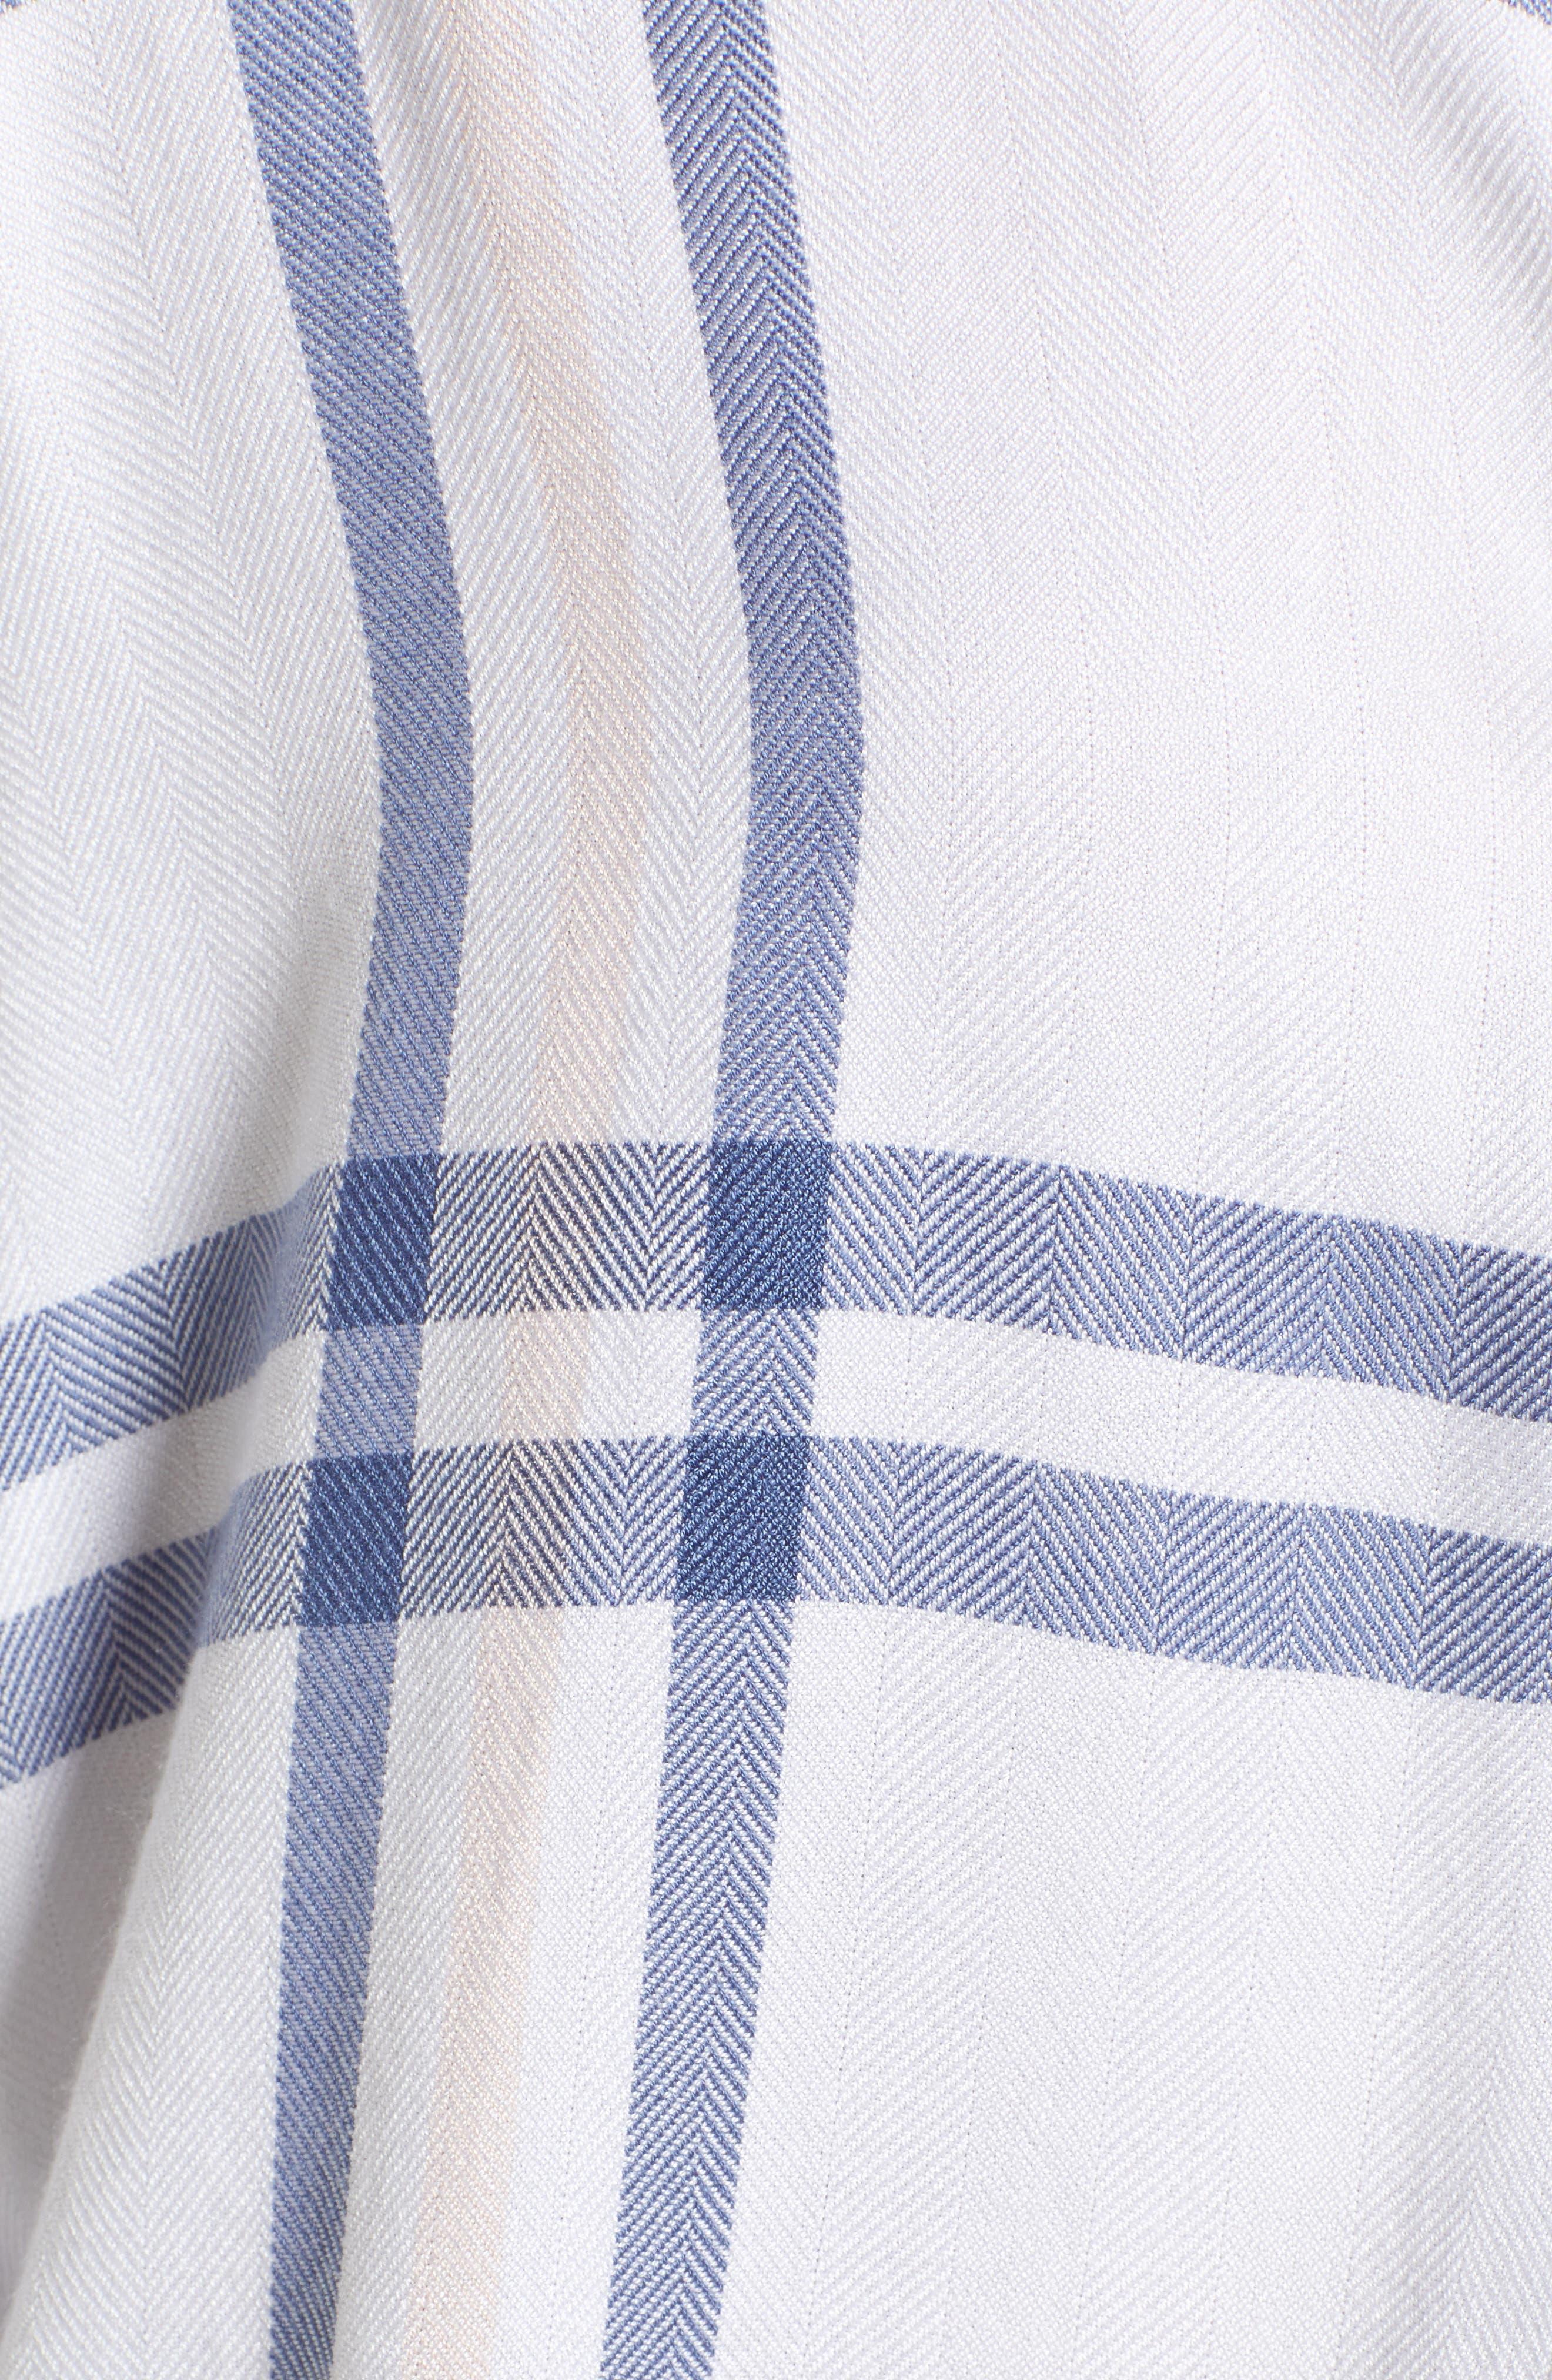 Hunter Plaid Shirt,                             Alternate thumbnail 6, color,                             INDIGO POWDER BLUSH